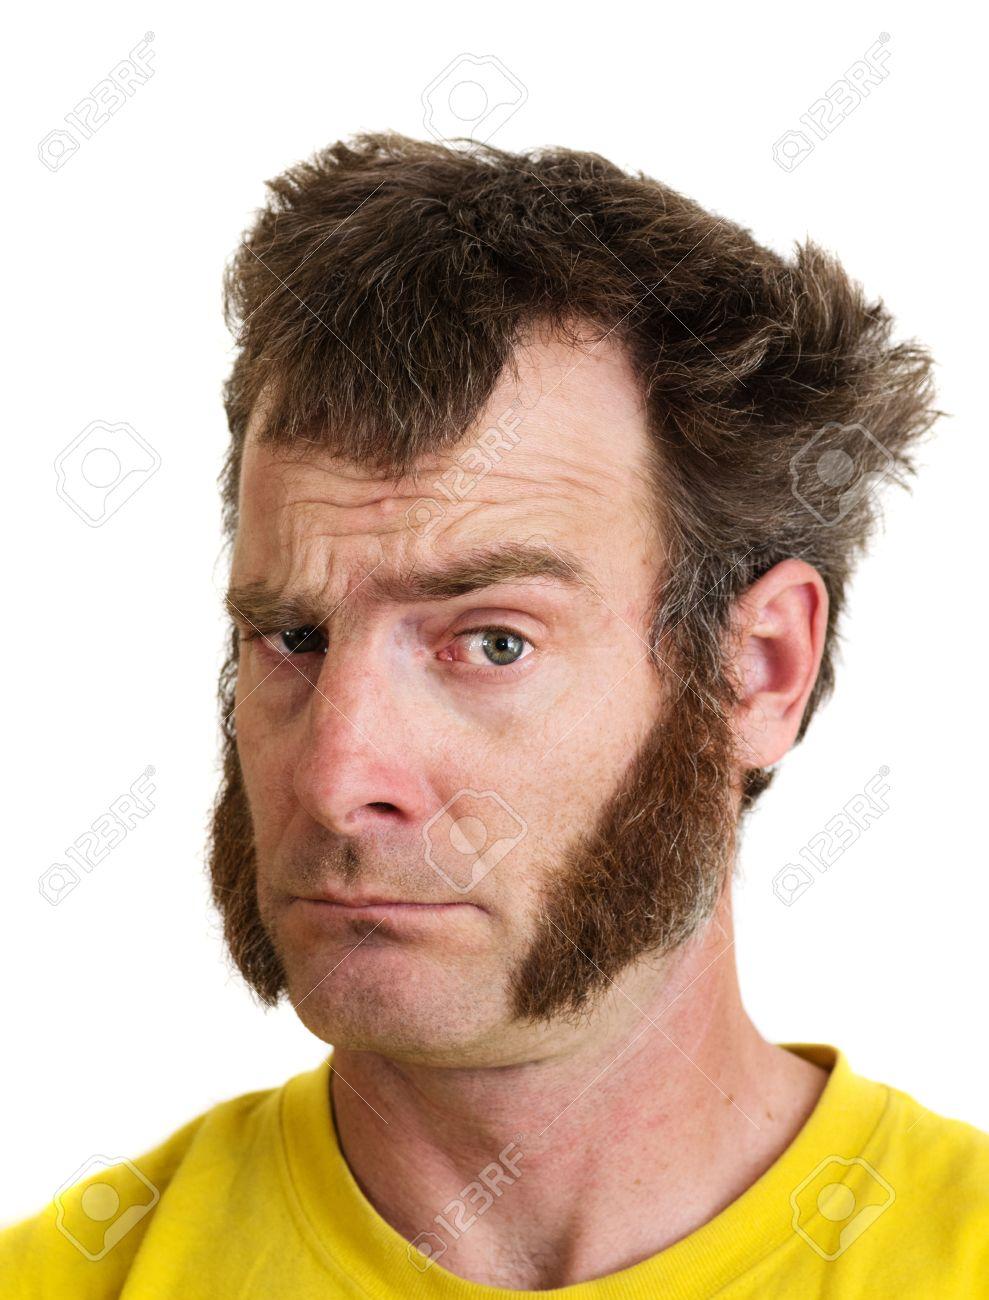 Raise One Eyebrow : raise, eyebrow, Large, Sideburns, Looks, Camera, Eyebrow.., Stock, Photo,, Picture, Royalty, Image., Image, 21621764.